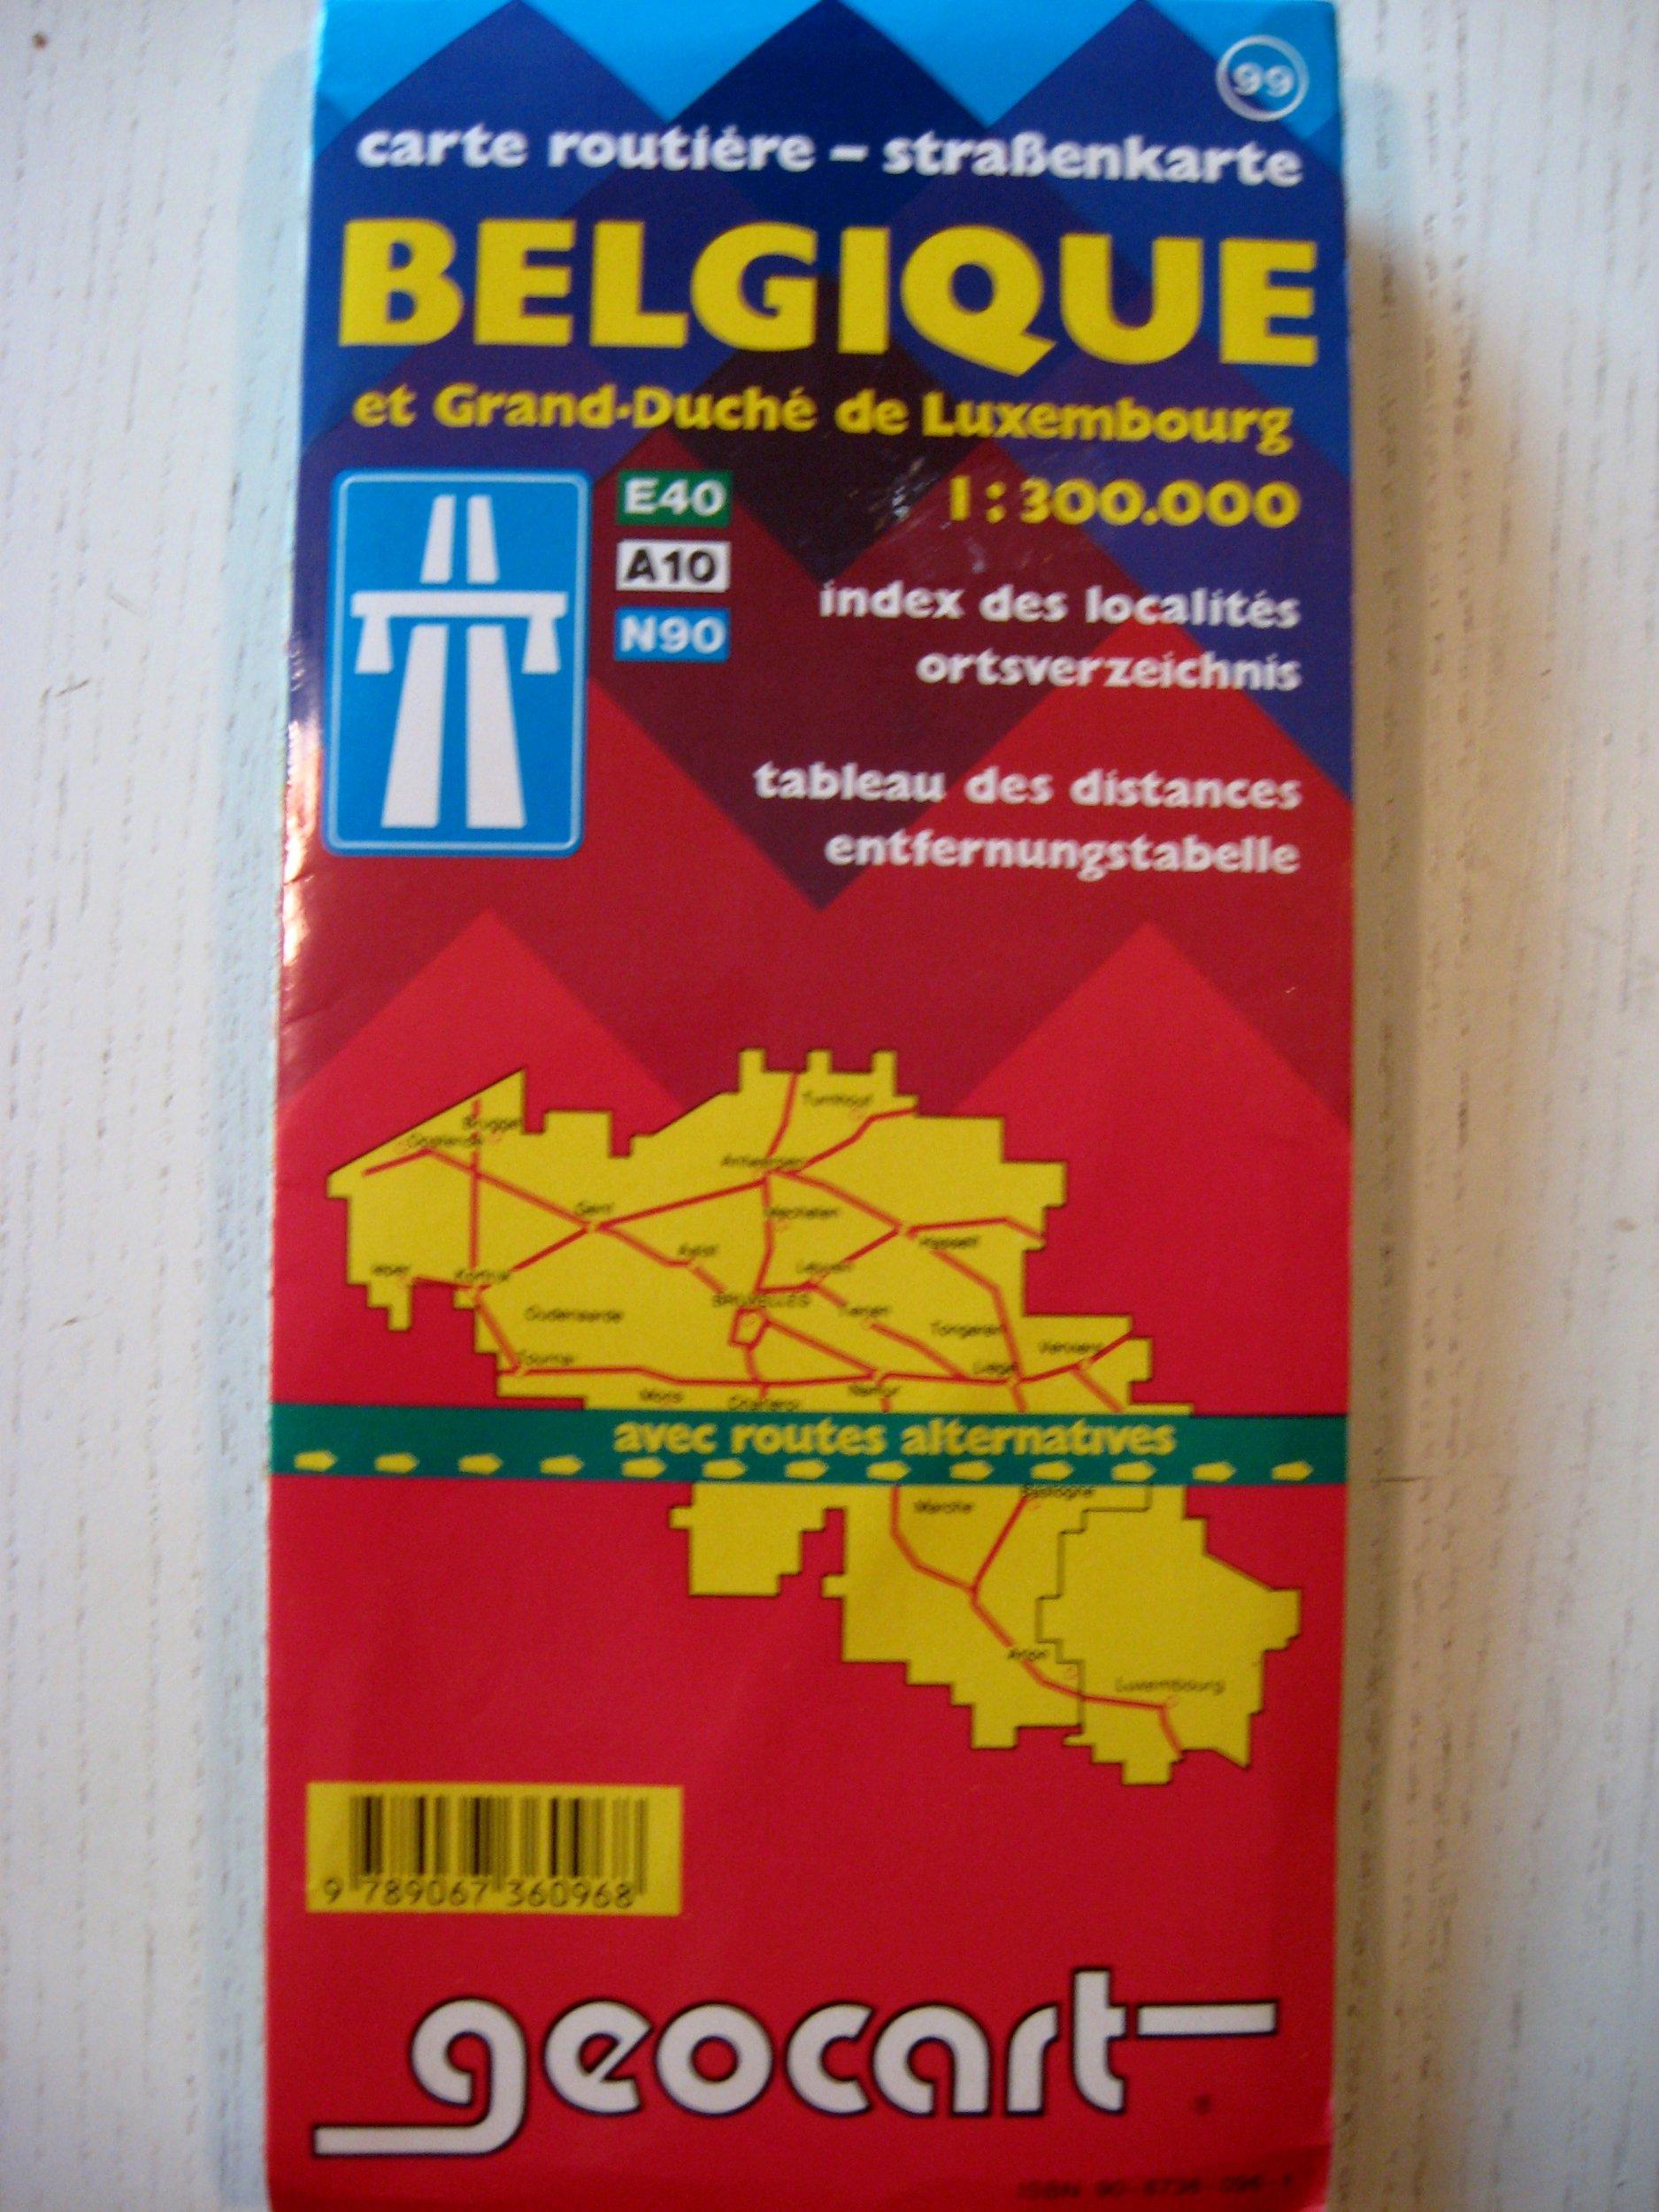 CARTE ROUTIERE-STRAbENKARTE ET GRAND-DUCHE DE LUXEMBOURG